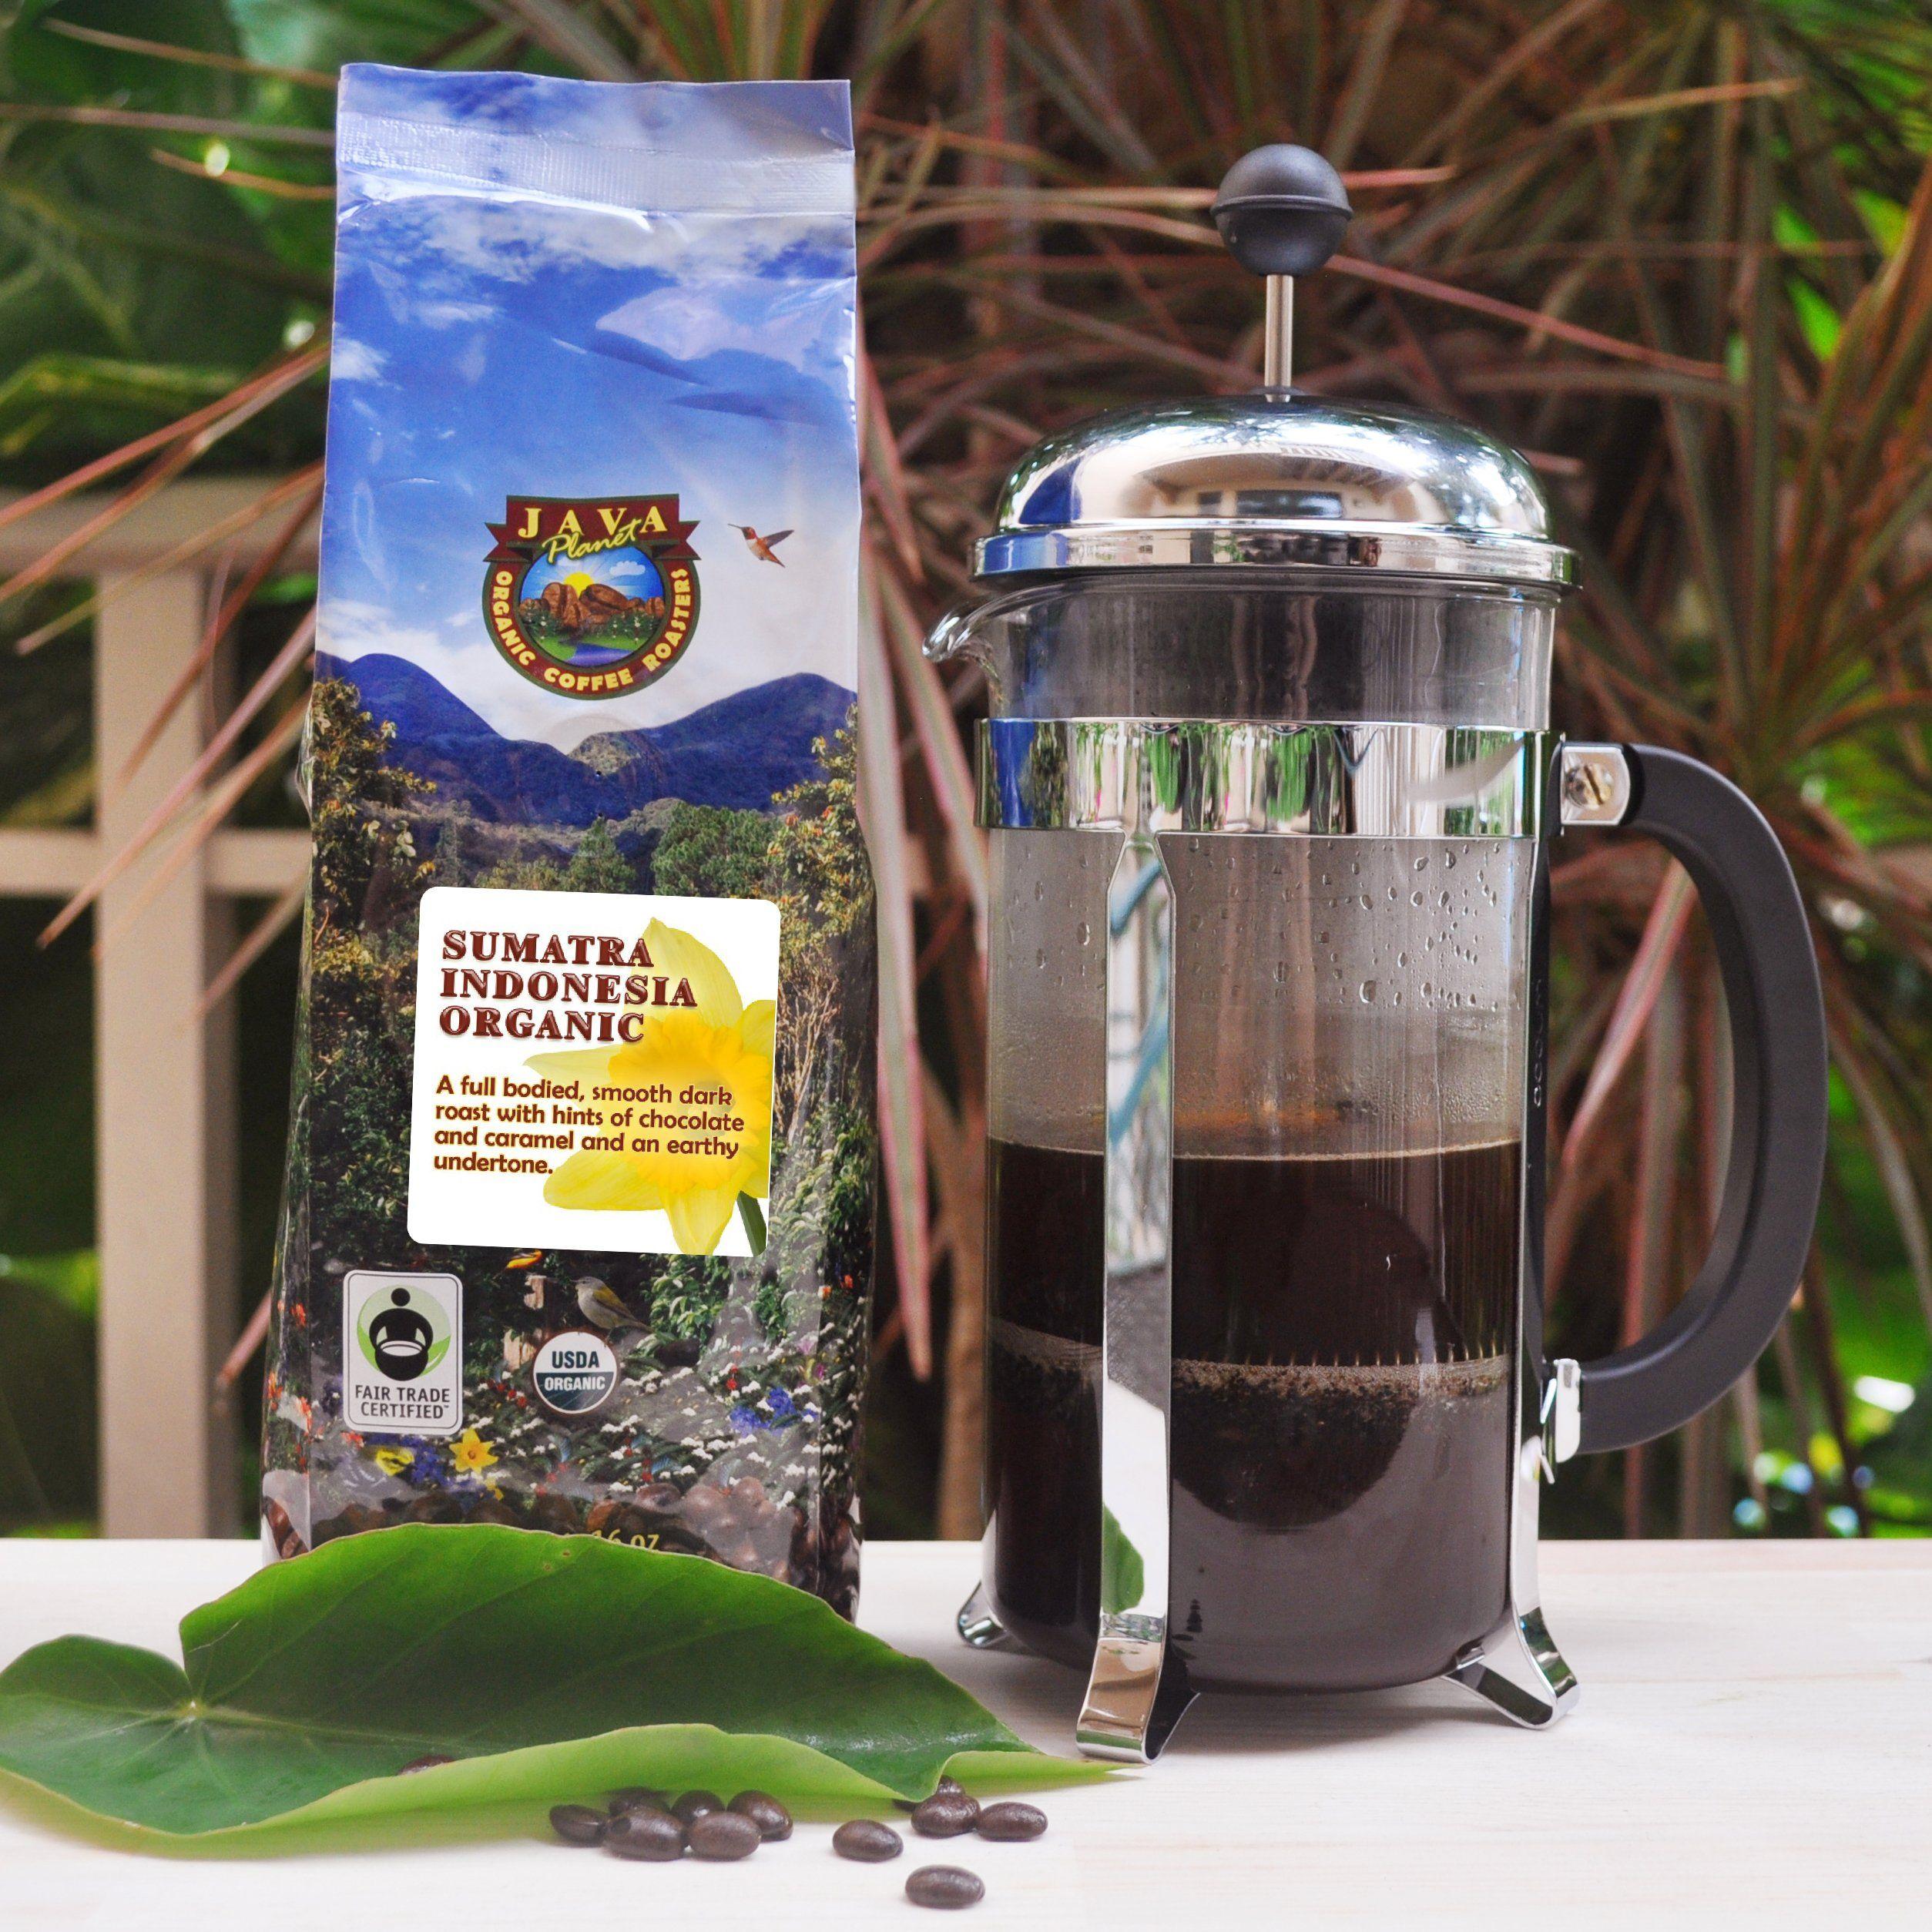 Java Sumatra Indonesian USDA Organic Coffee Beans